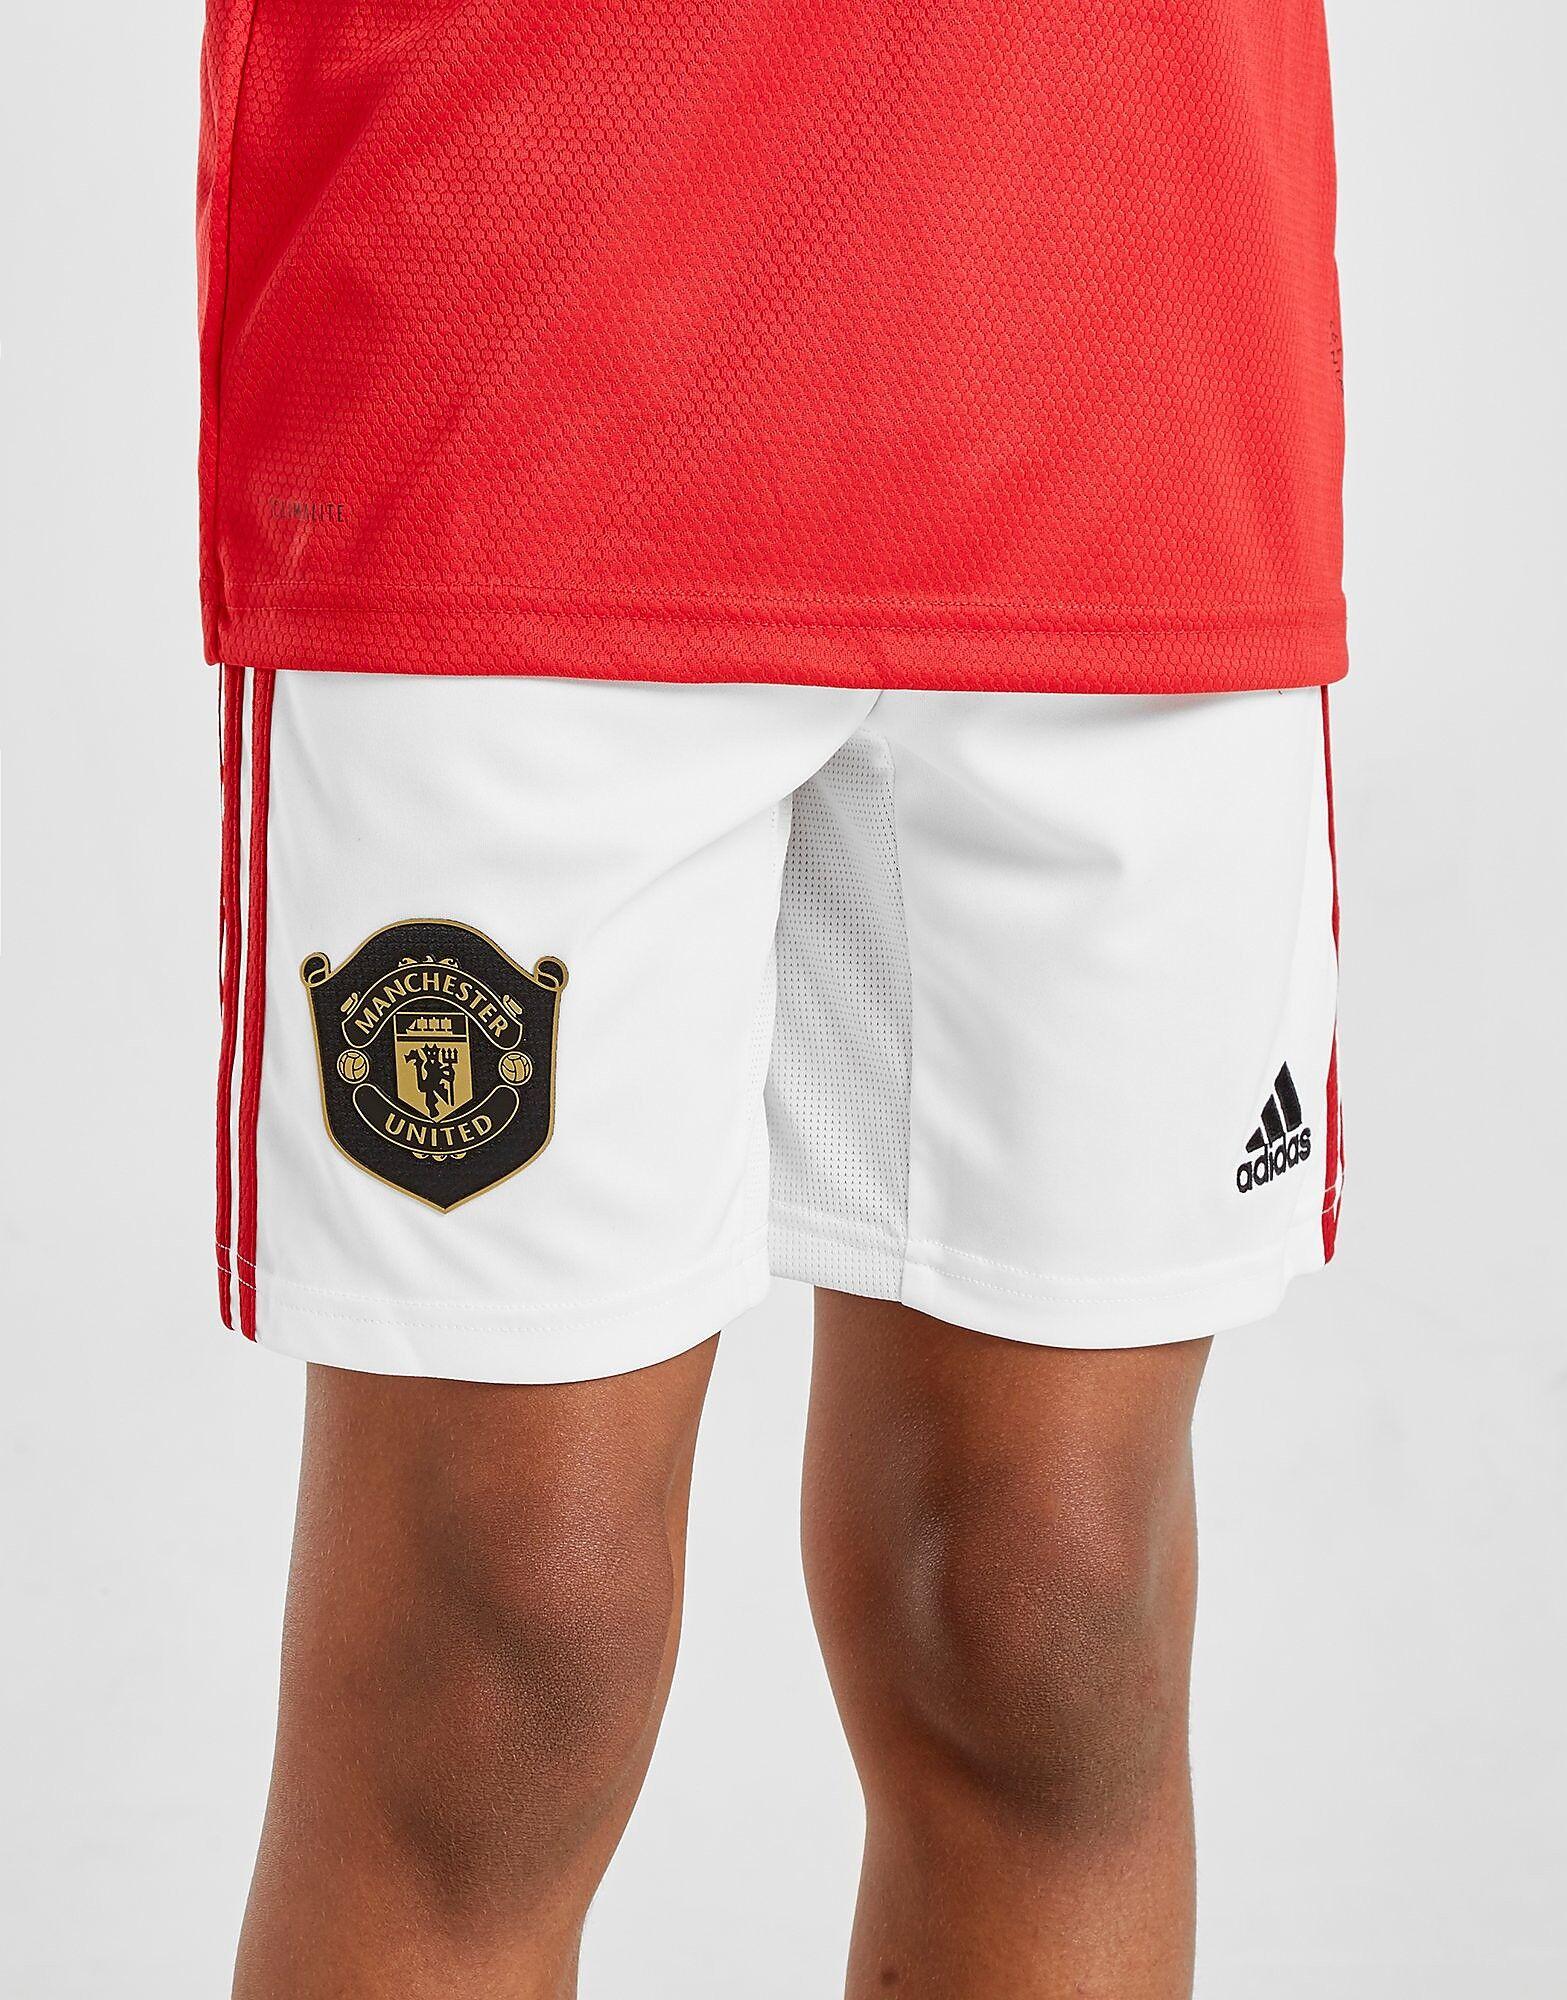 Image of Adidas Manchester United FC 19/20 Kotishortsit - Kids, Valkoinen